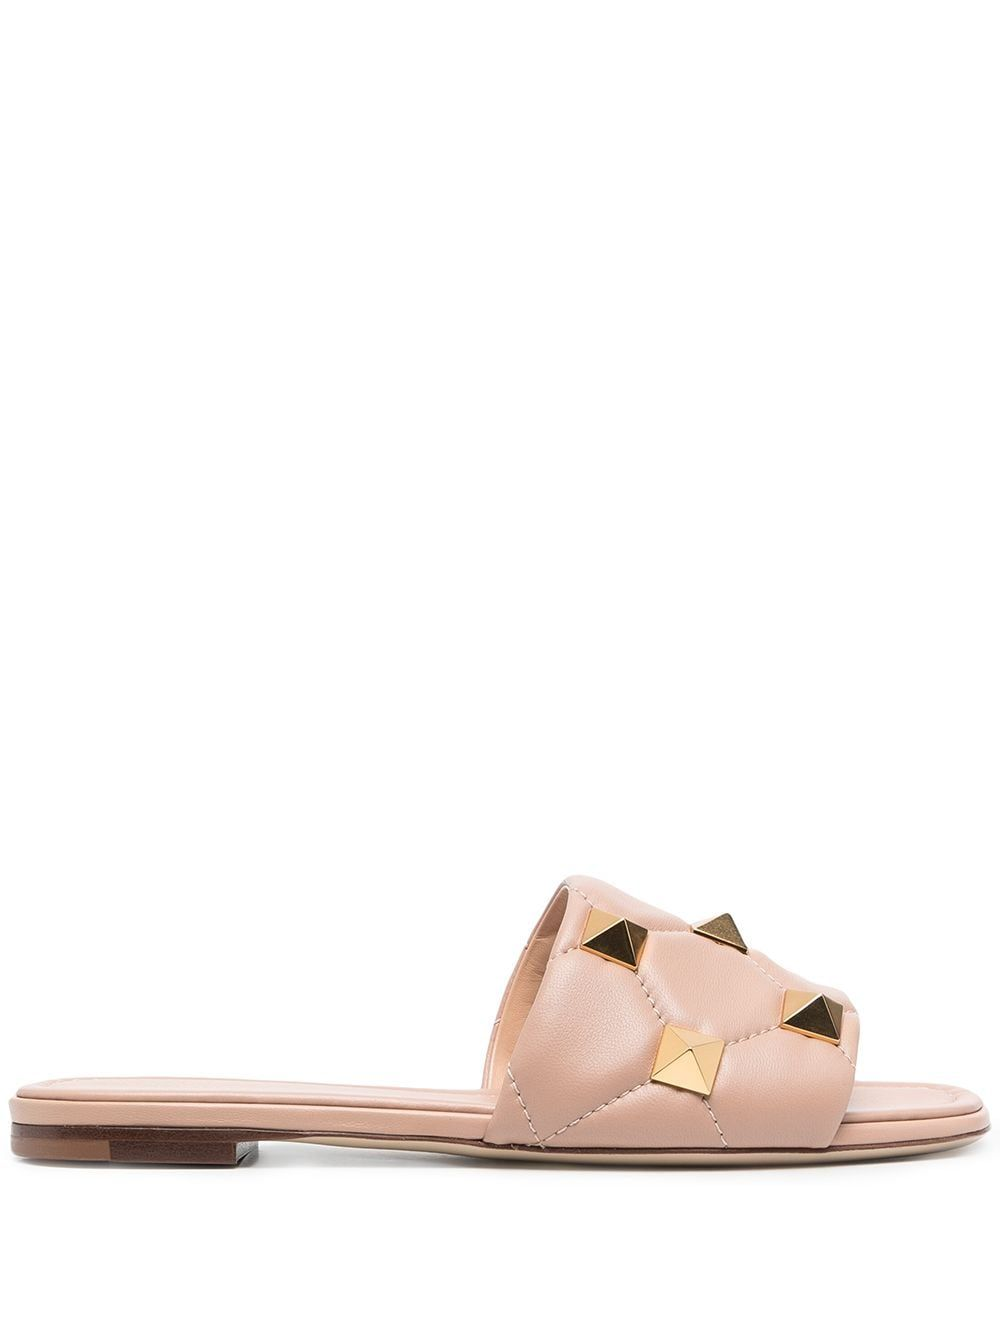 Romanstud leather sandals